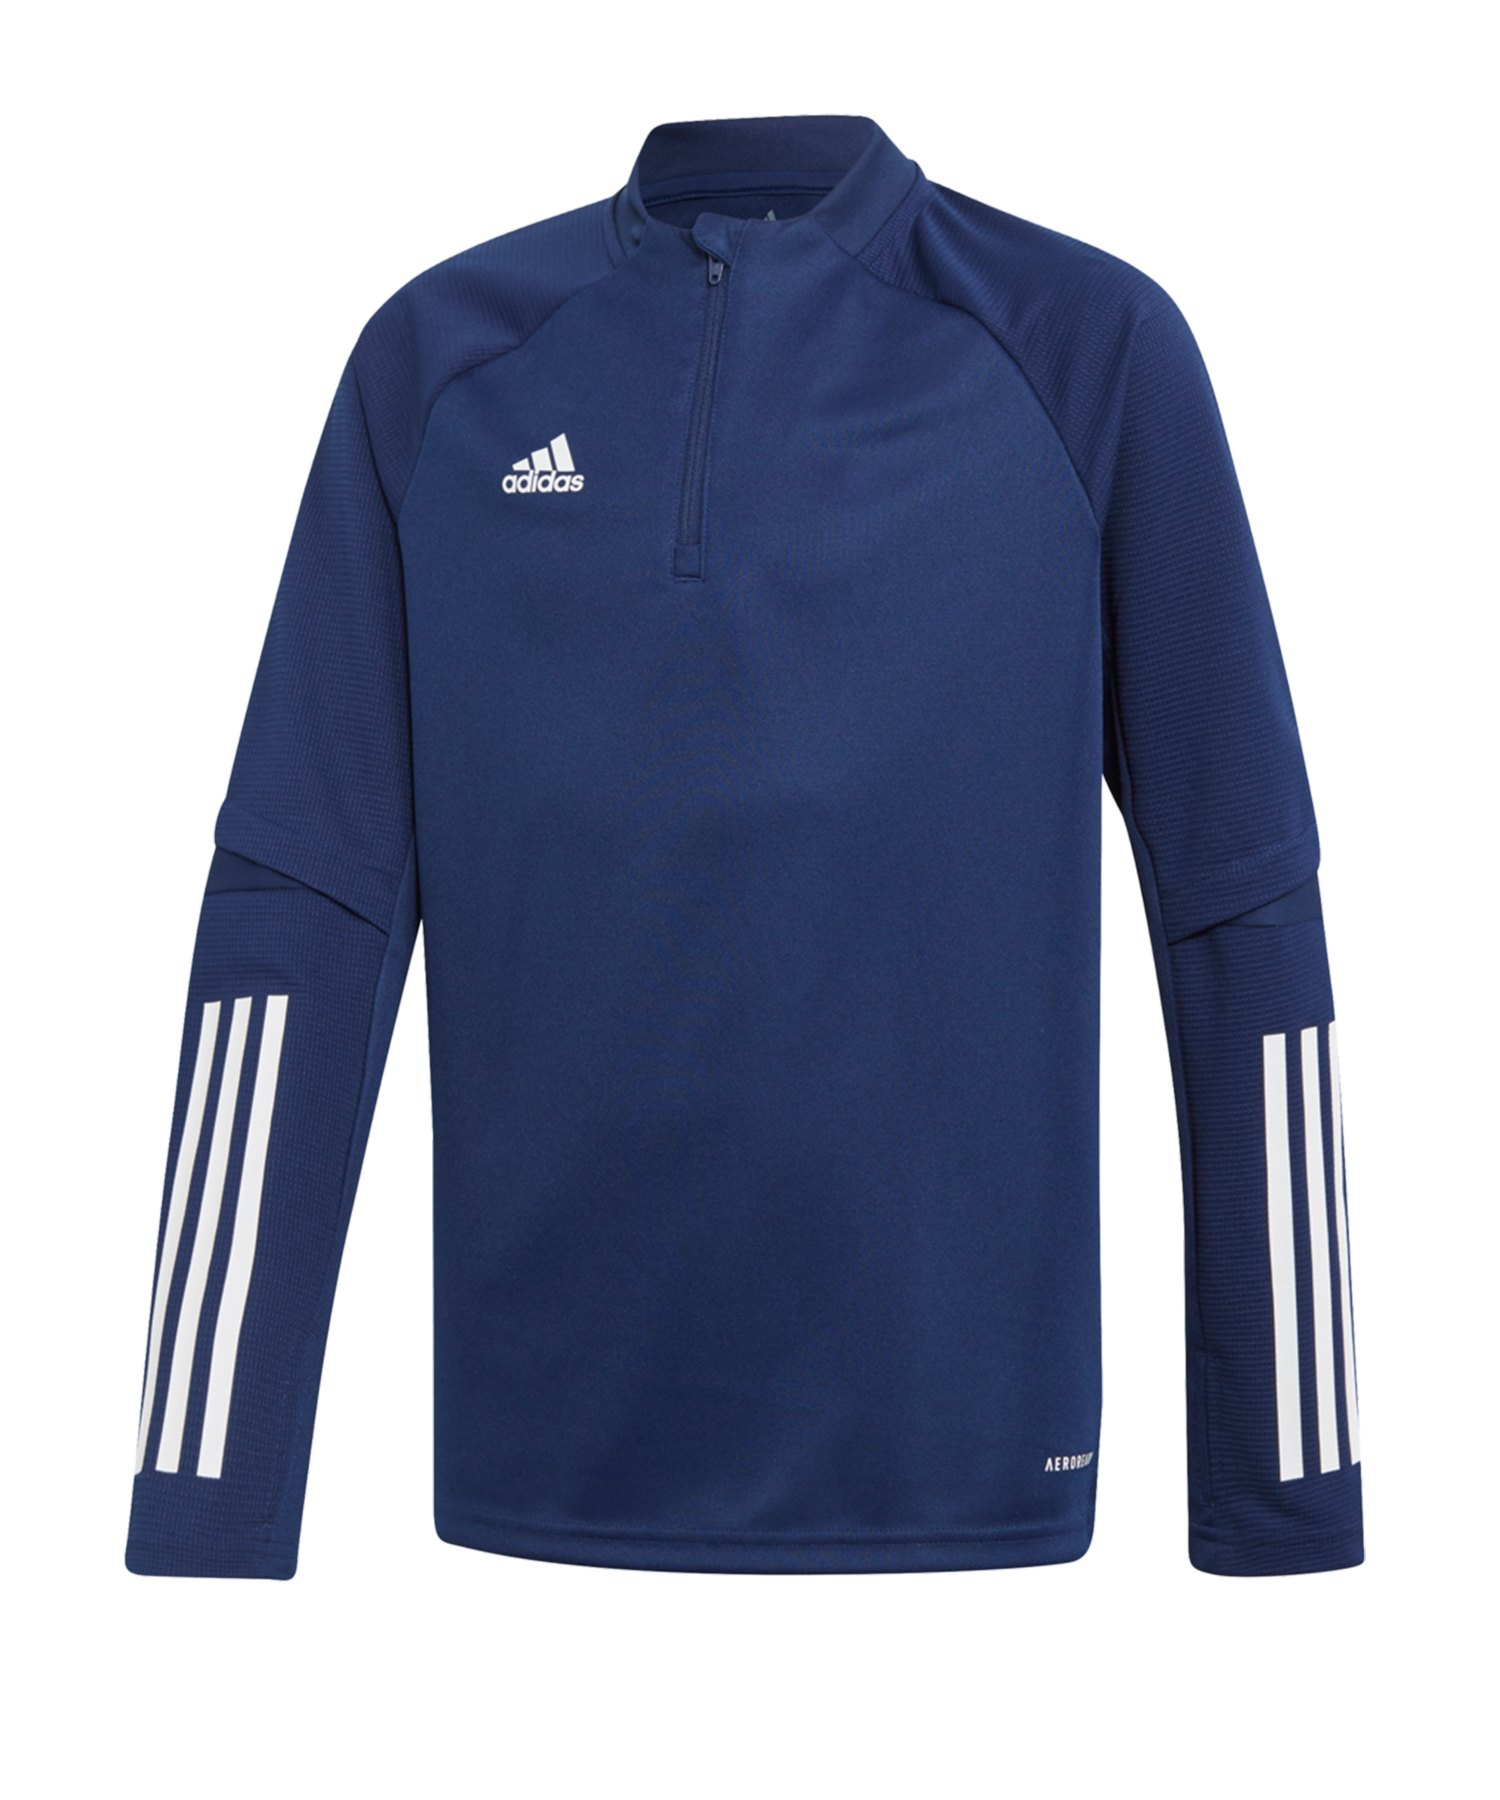 adidas Condivo 20 Trainingstop LA Kids Dunkelblau - blau